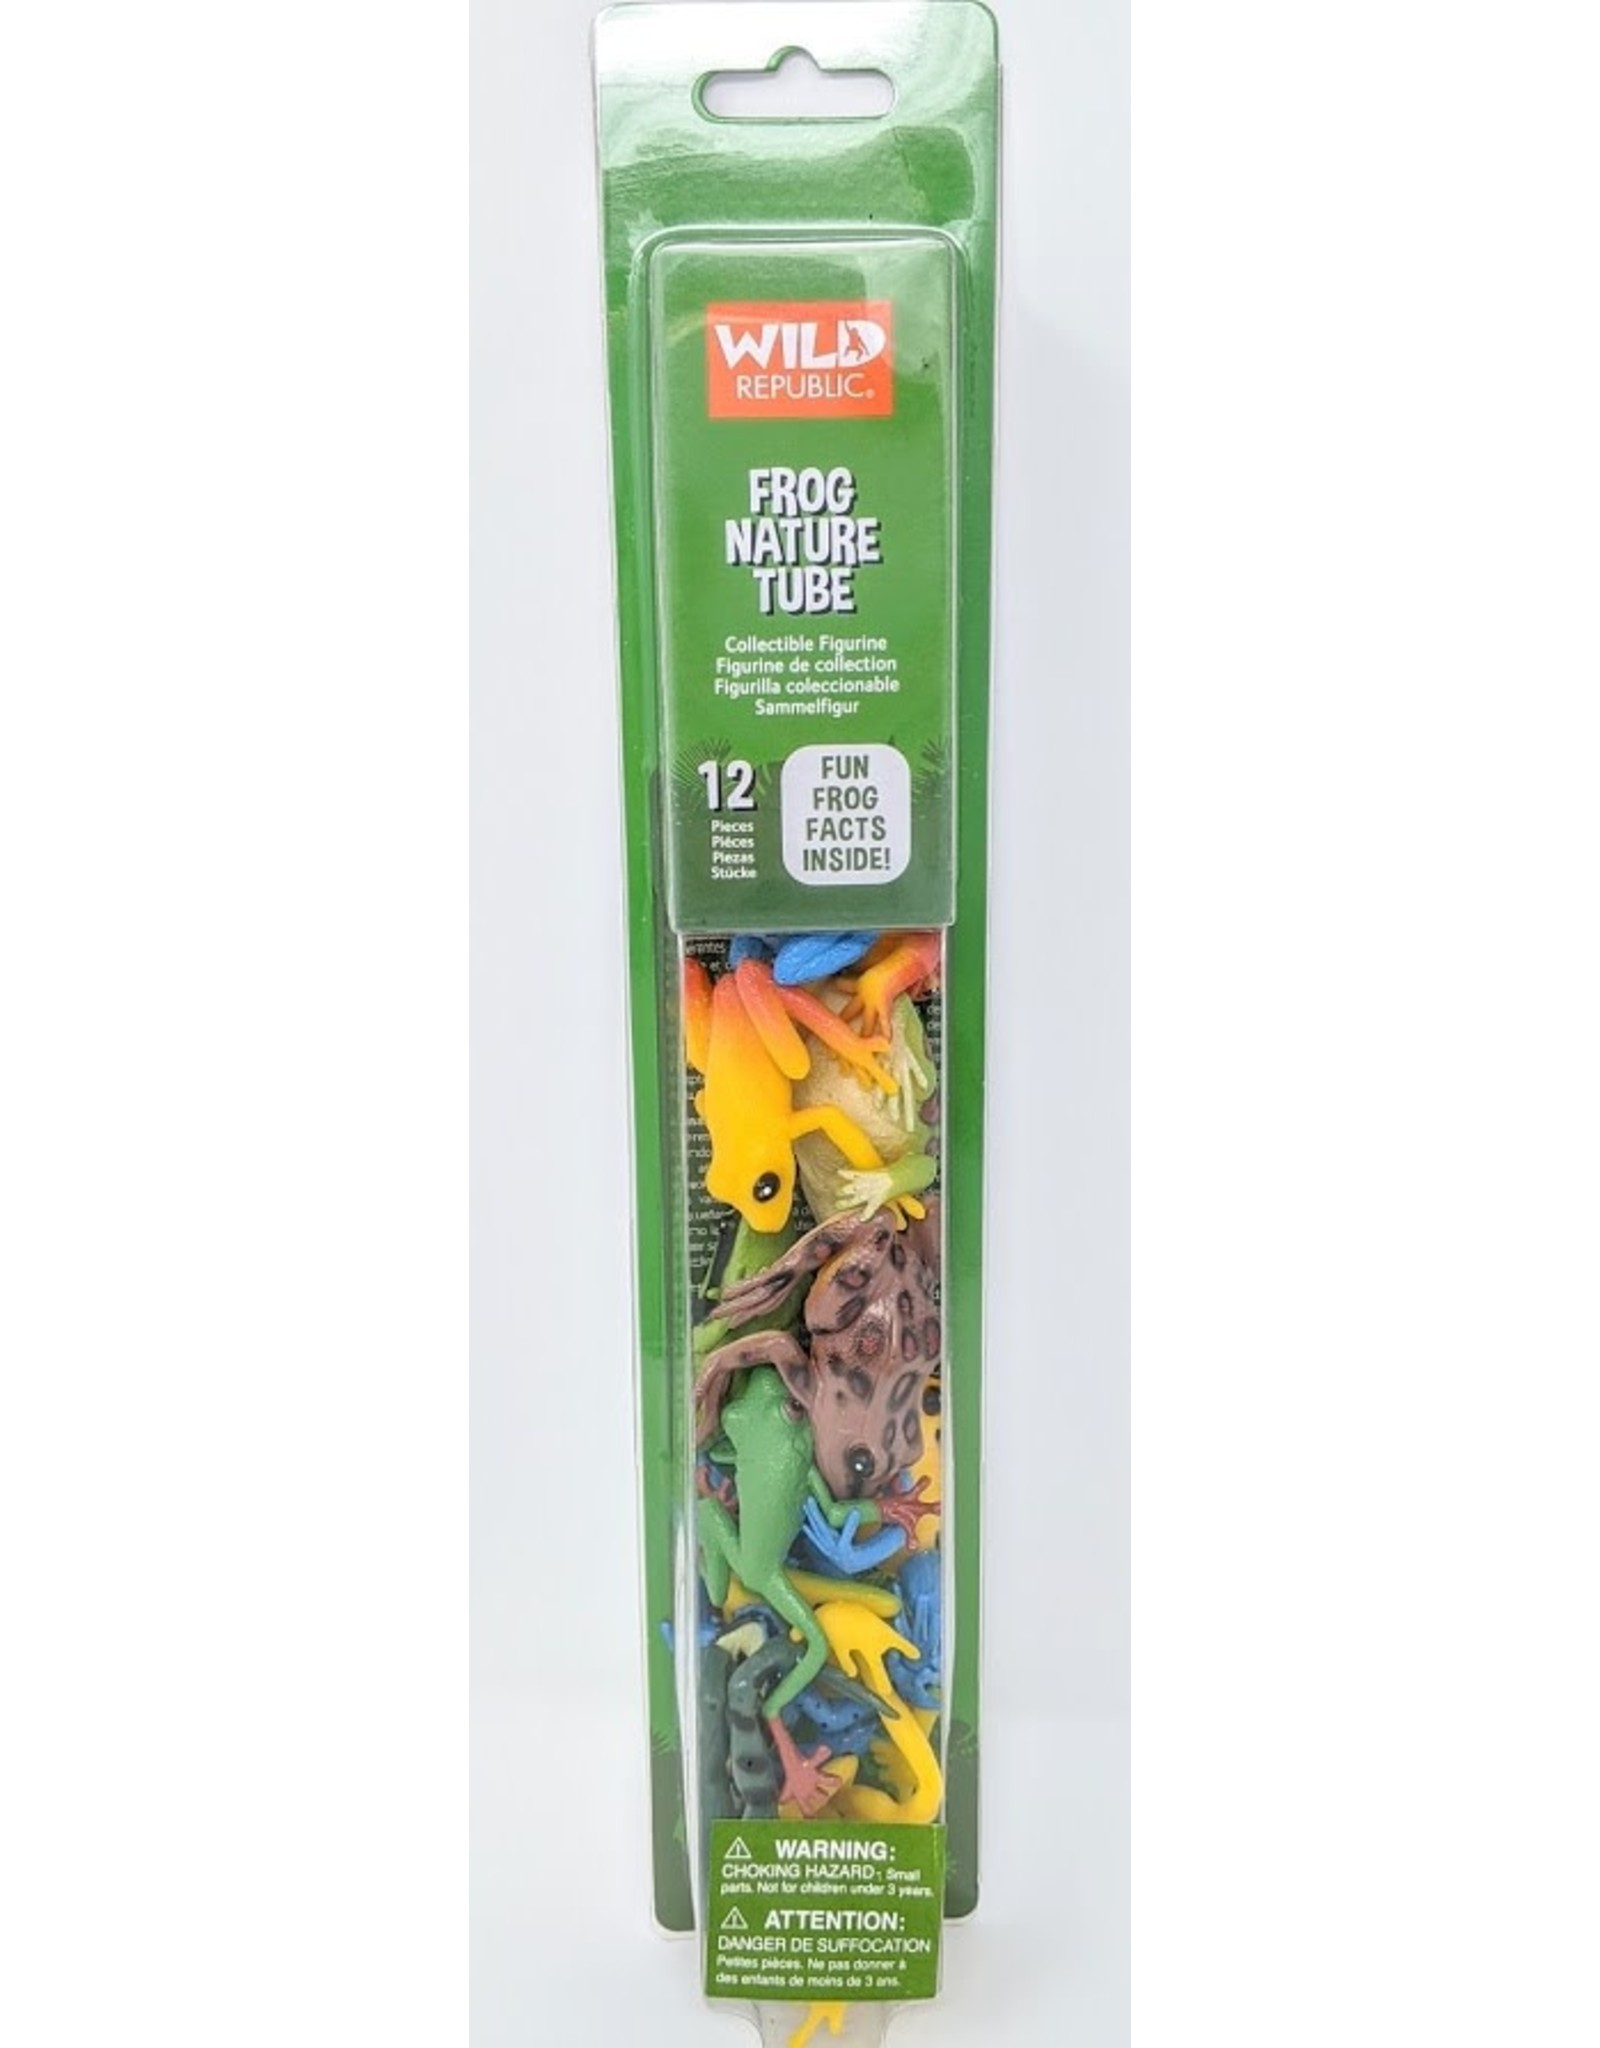 Wild Republic Frogs Nature Tube